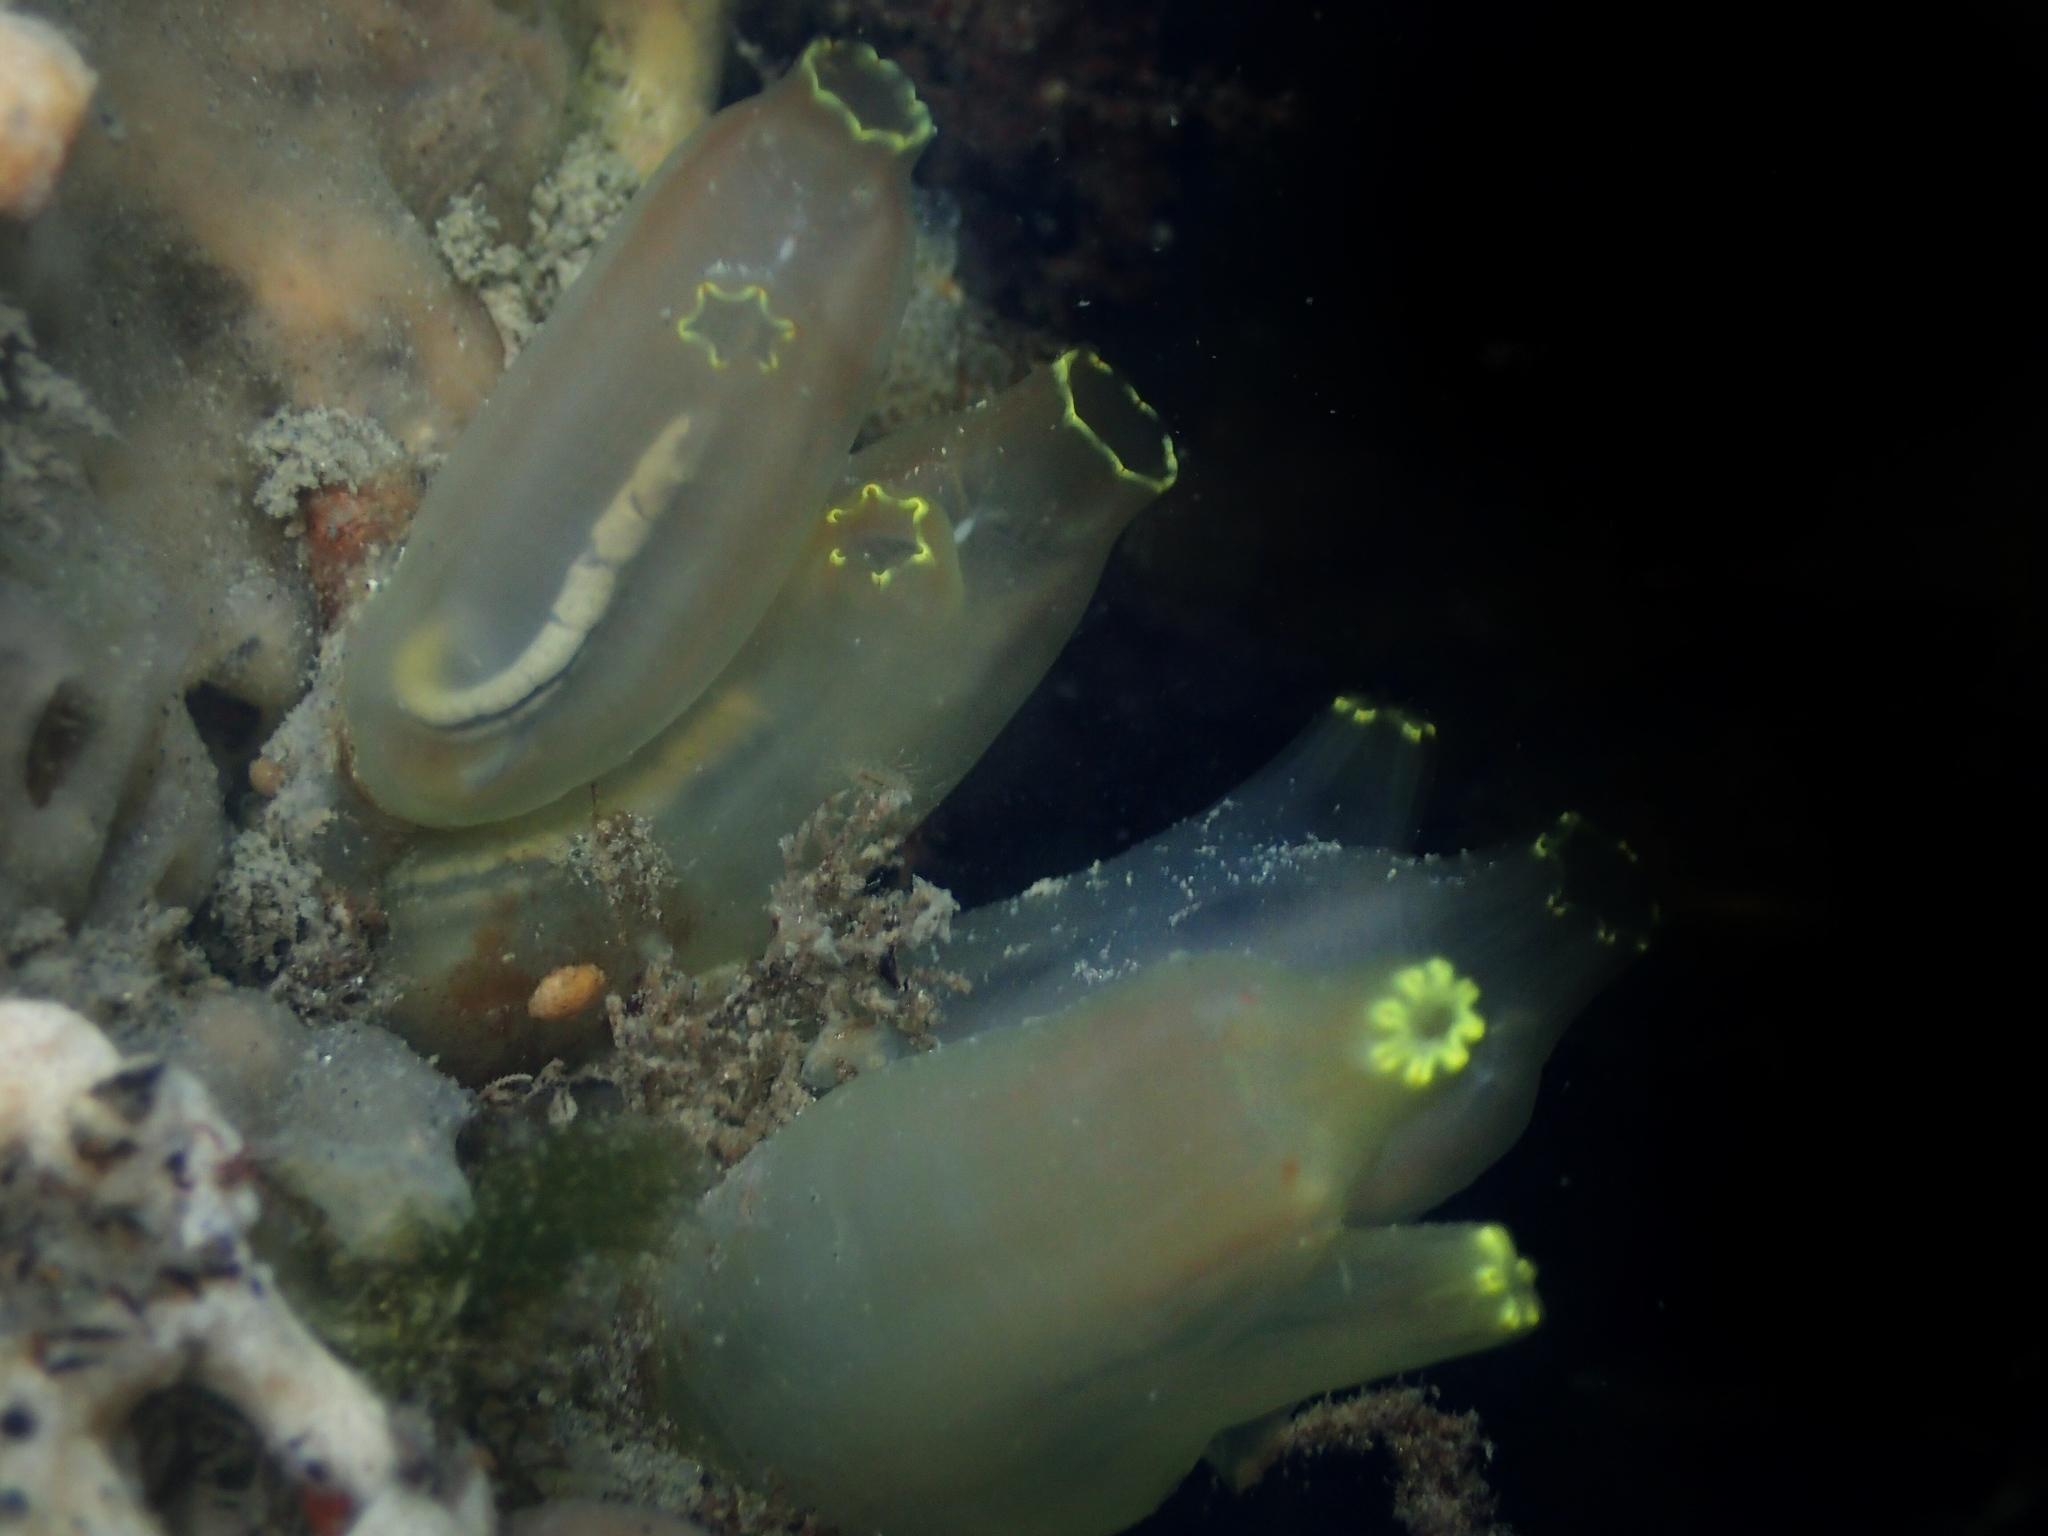 Image of Ascidian